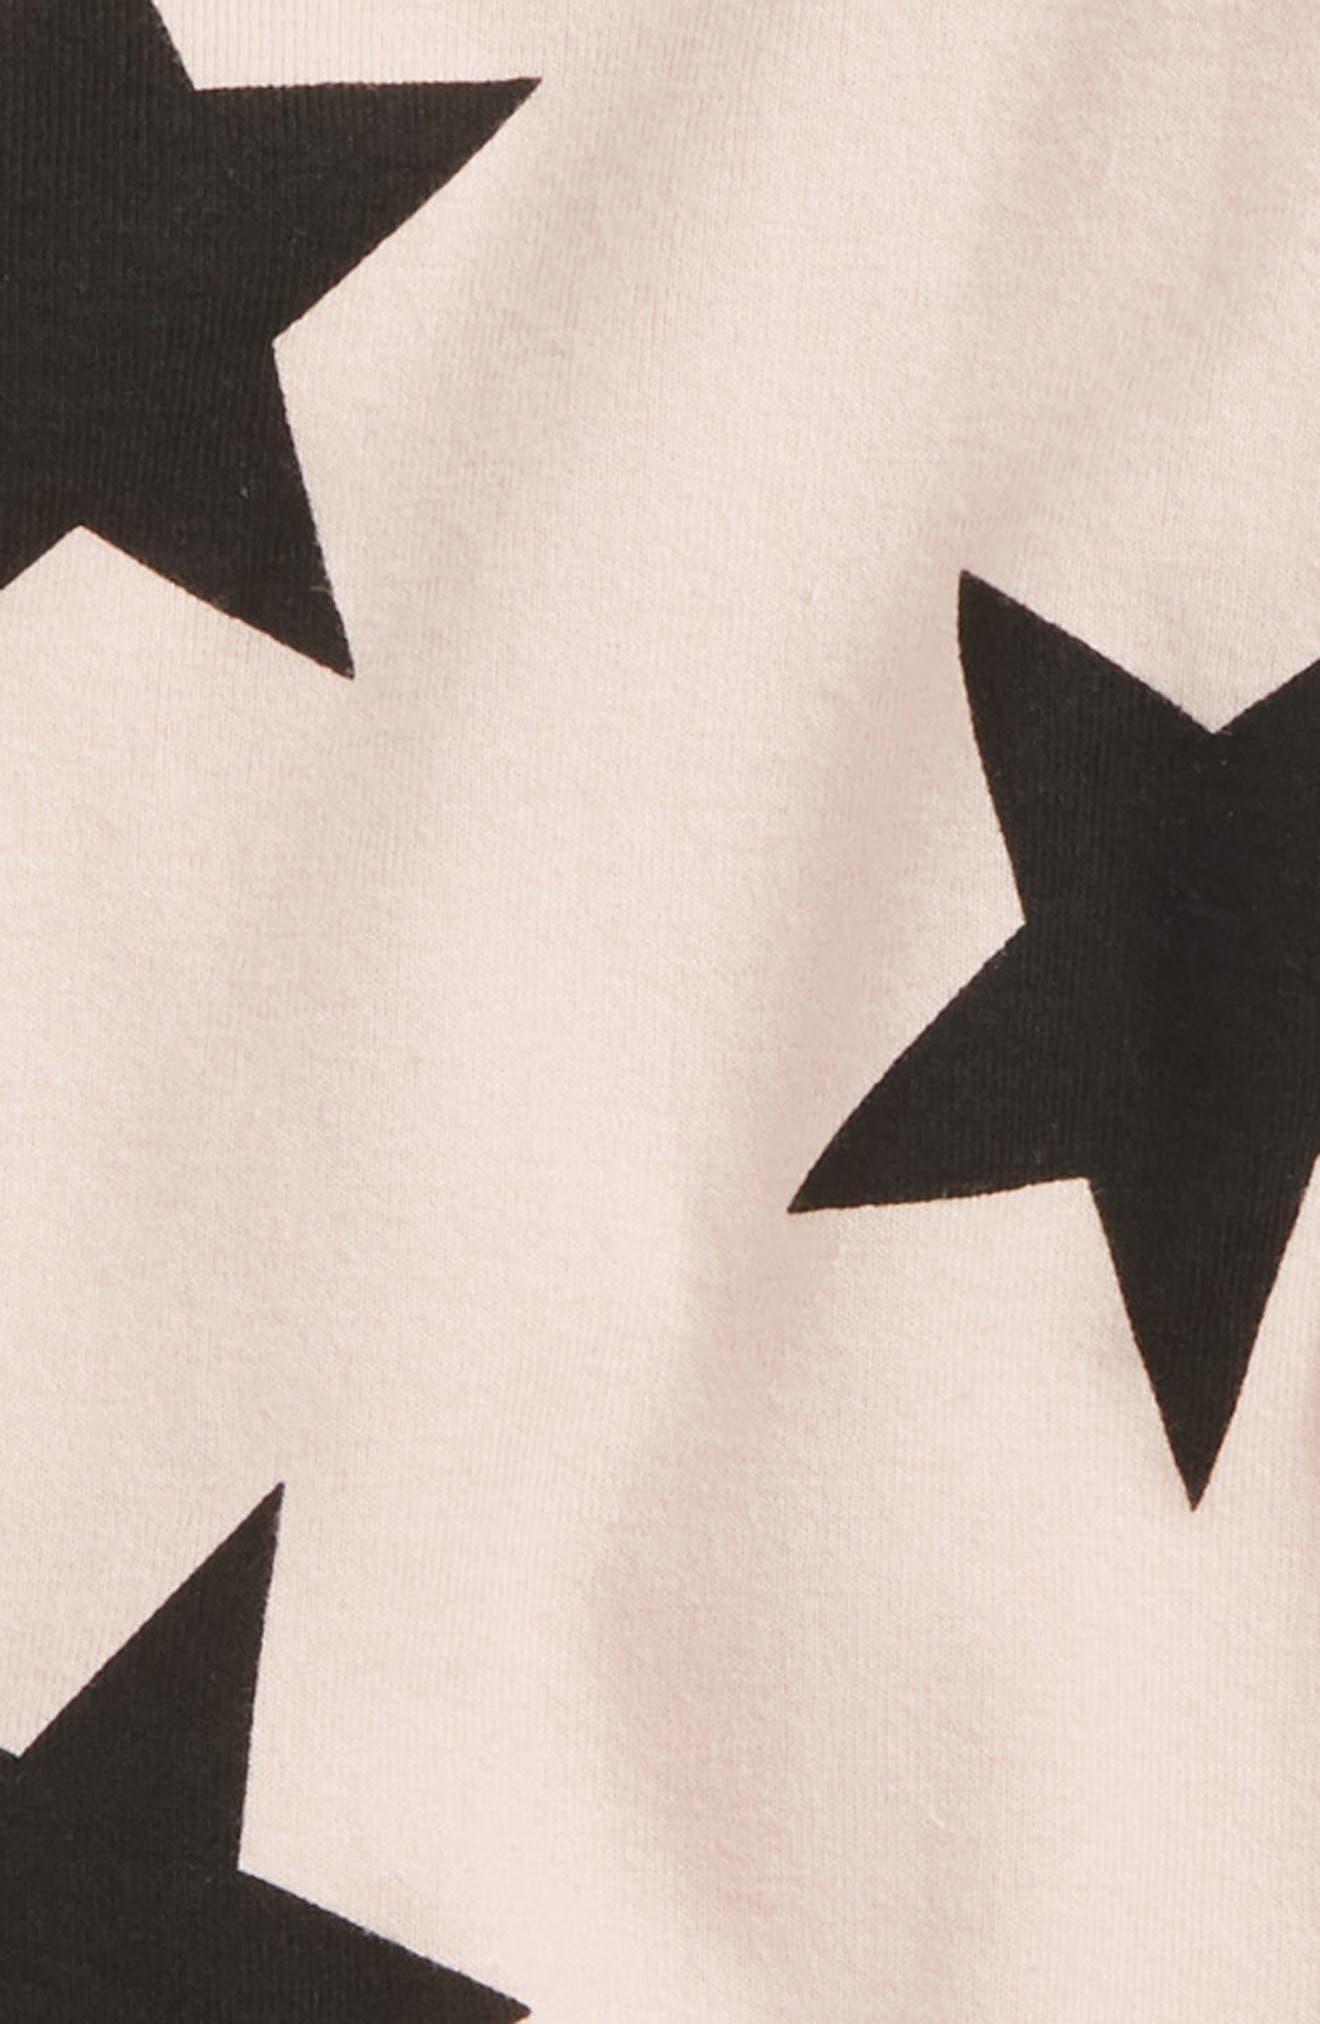 Star Print Footie,                             Alternate thumbnail 2, color,                             680